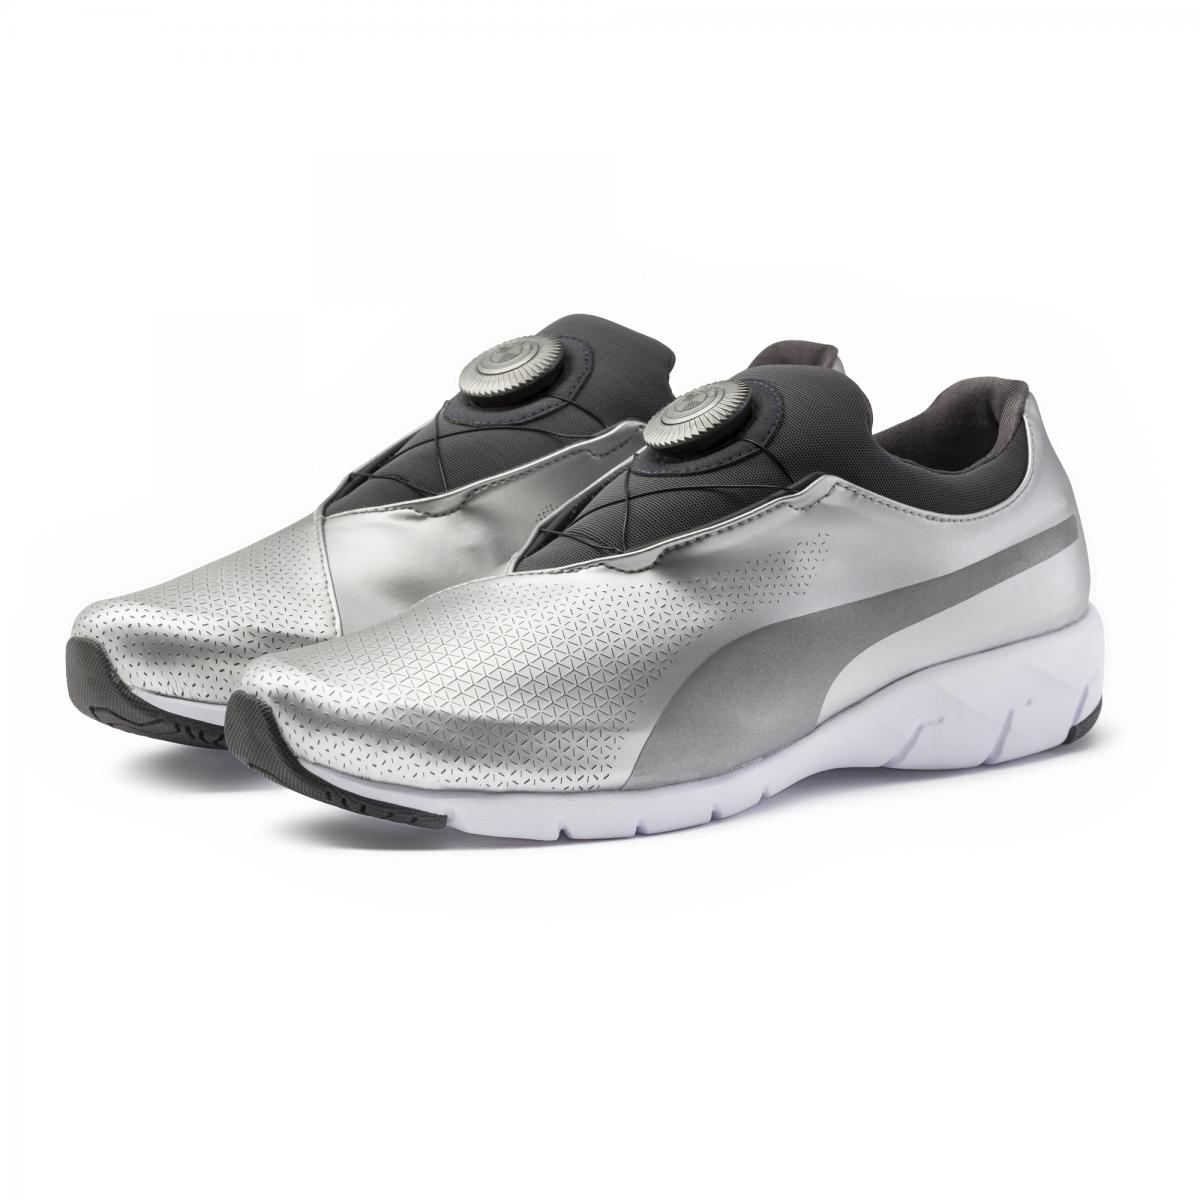 definido fluido Verde  BMW and Puma team up to make a silver shoe | BimmerFest BMW Forum